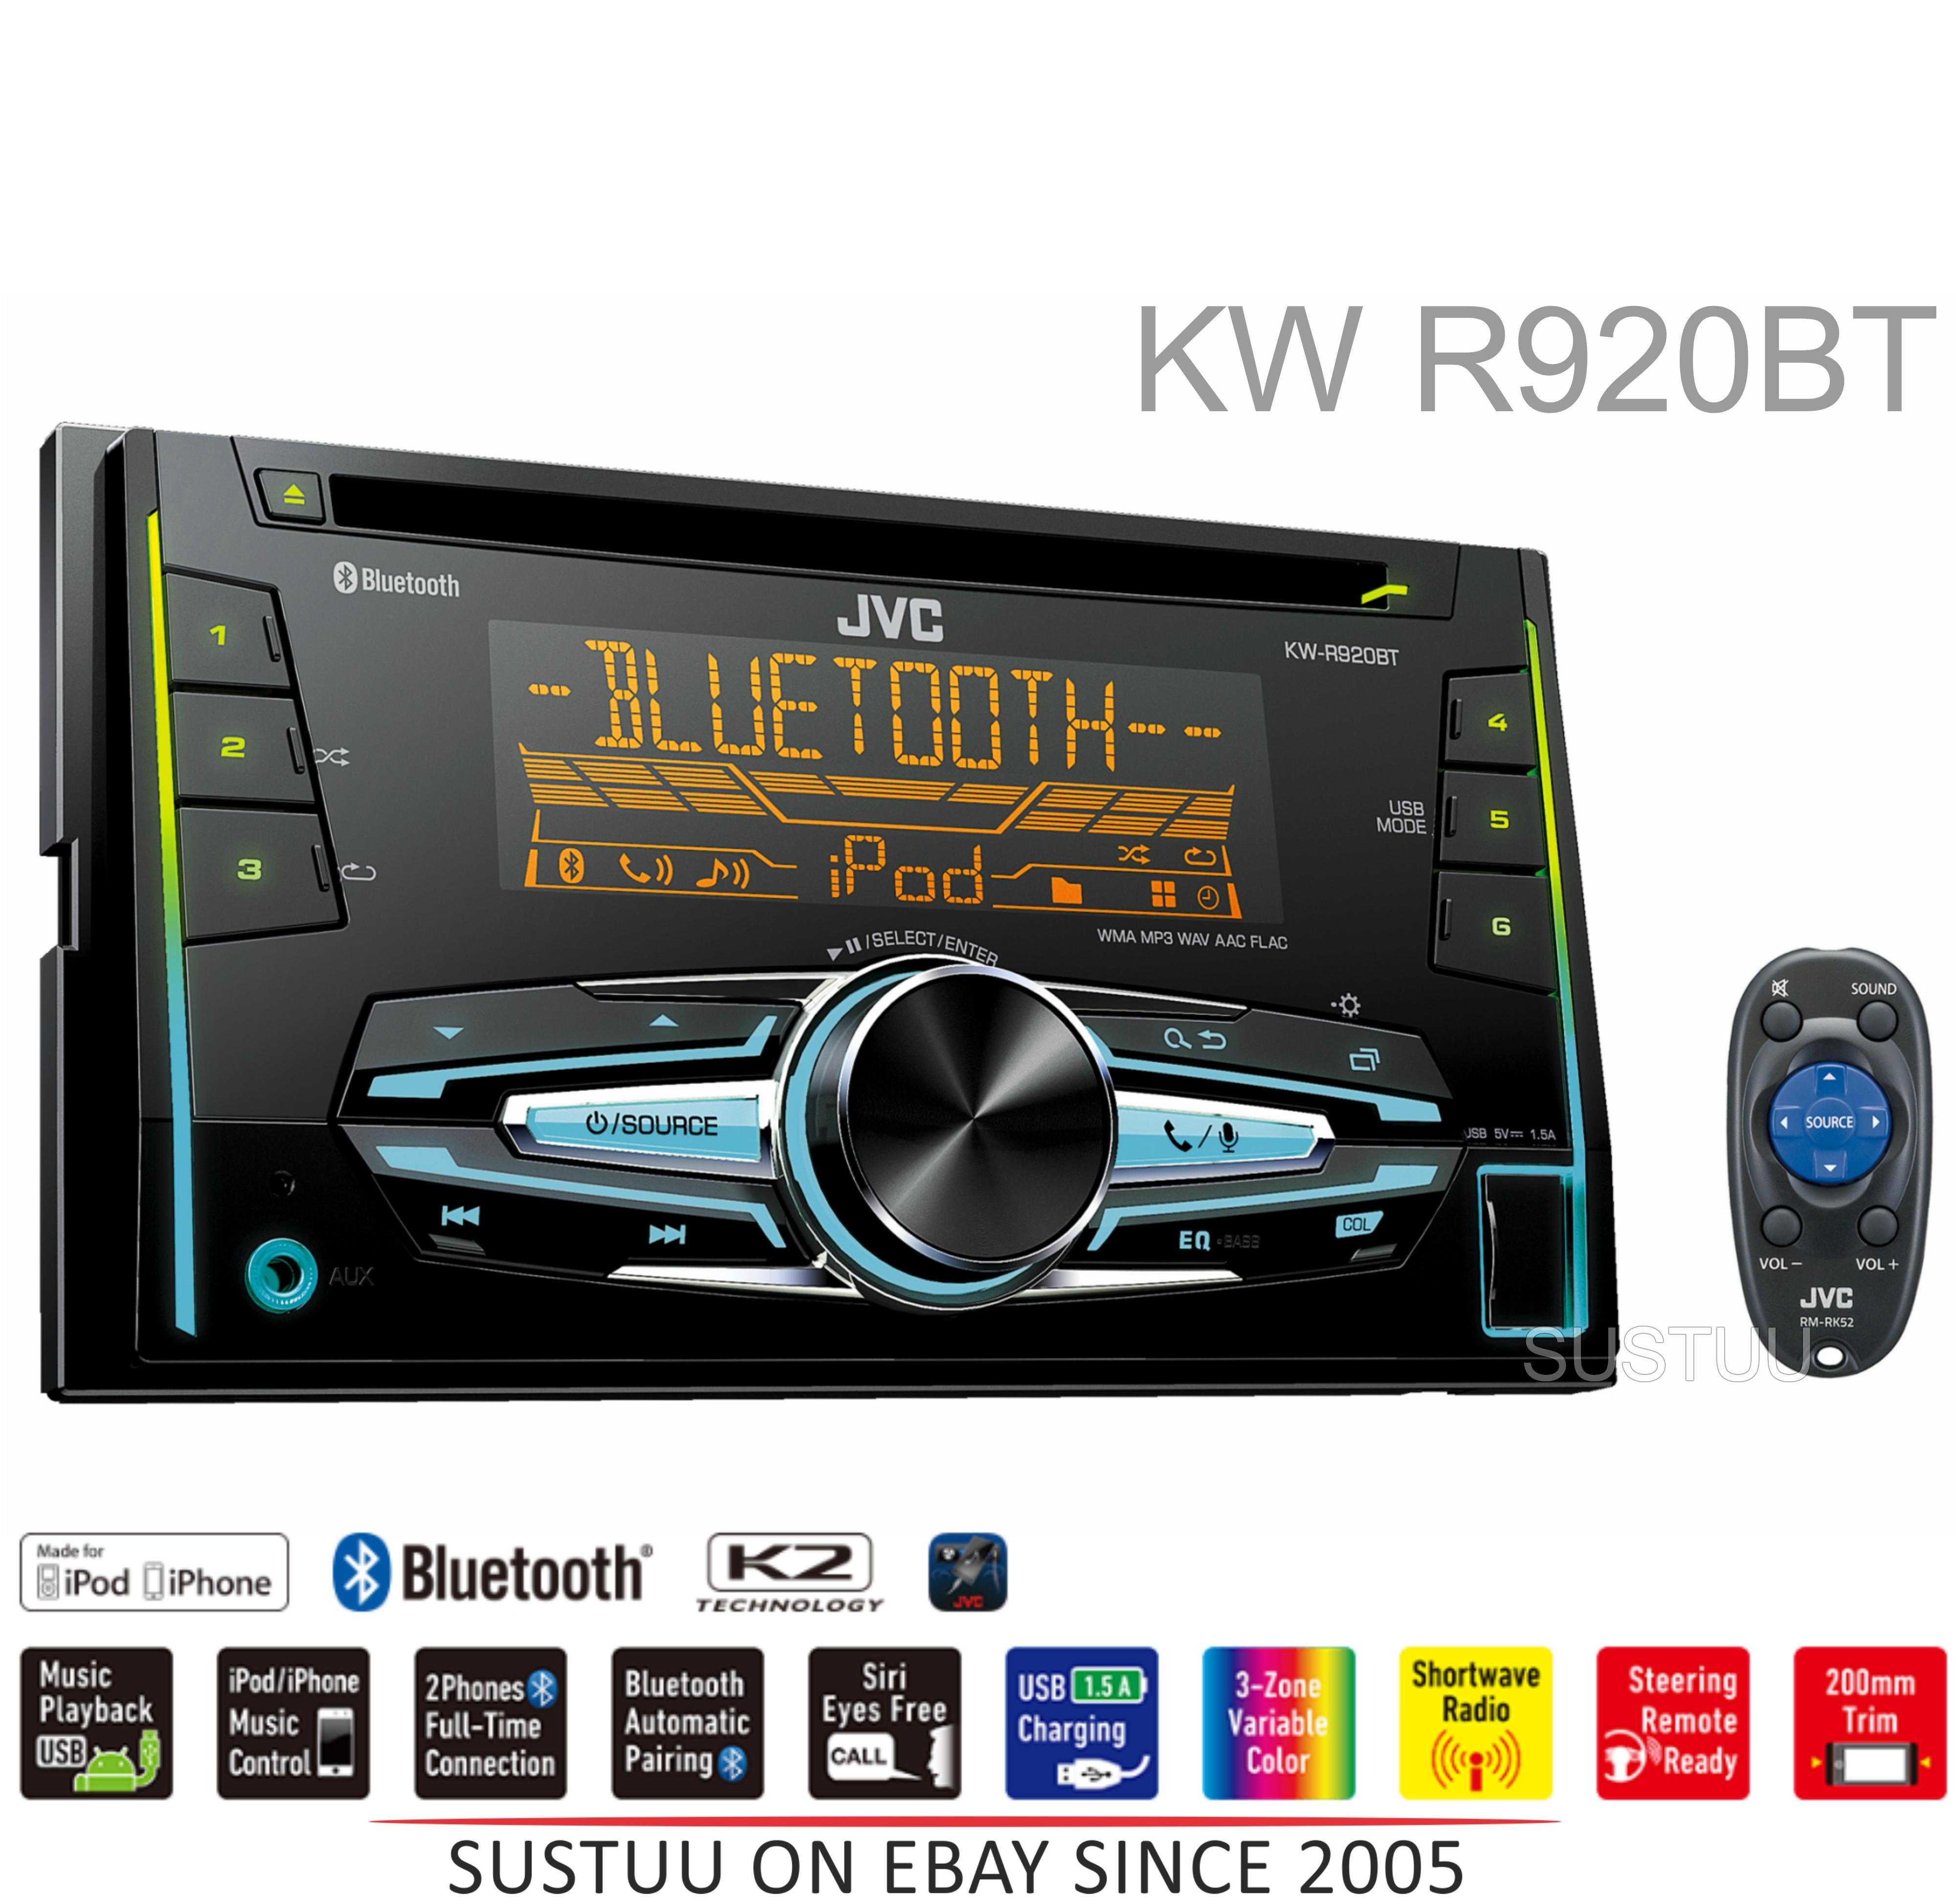 jvc kw r920bt car stereo double din bluetooth mp3 usb aux. Black Bedroom Furniture Sets. Home Design Ideas